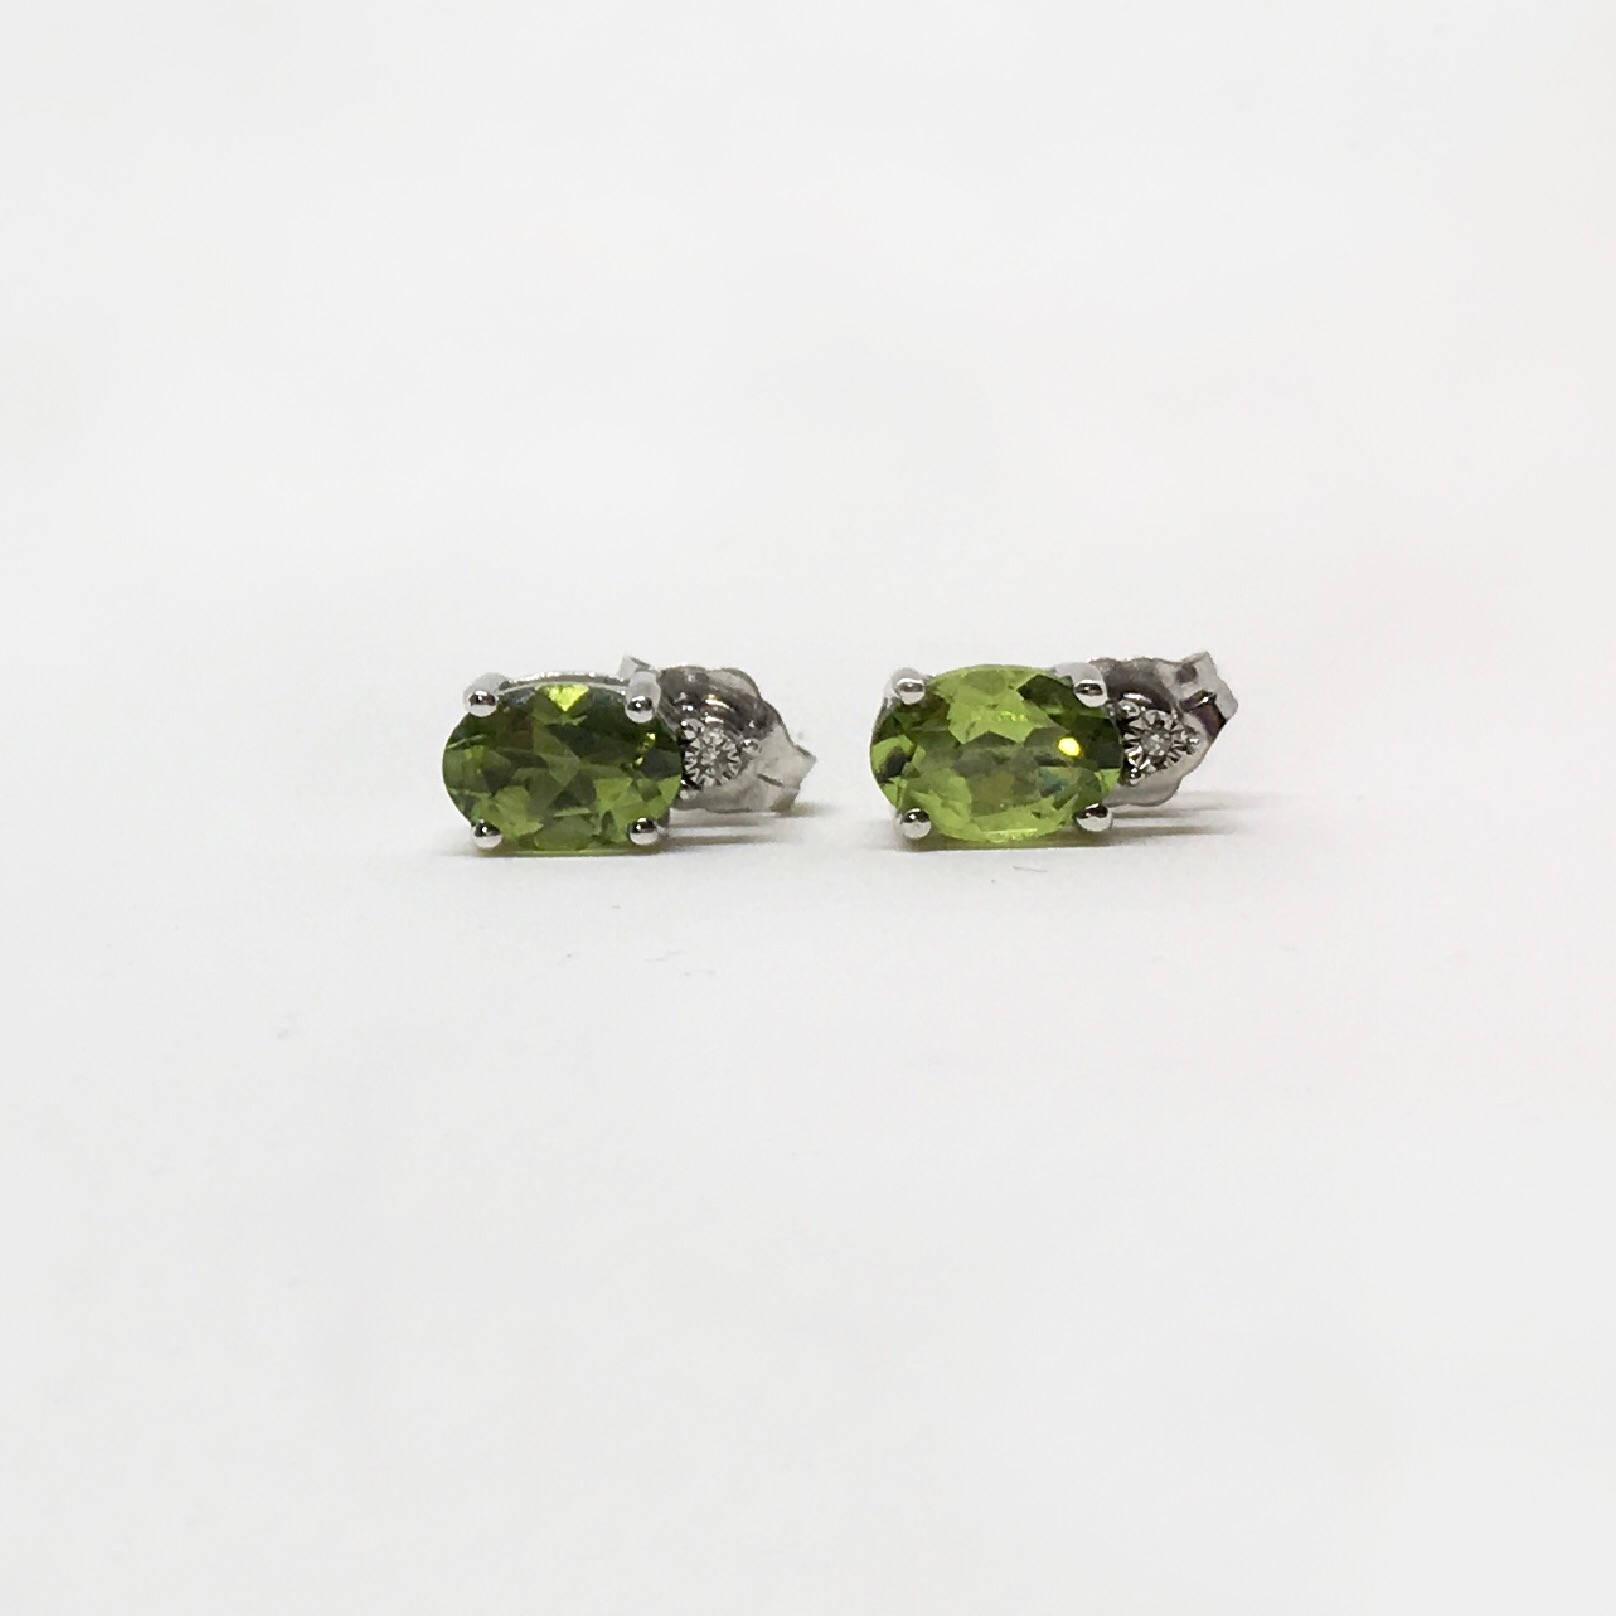 925 Silver Natural Peridot 1 80 Ct Earrings Appraised